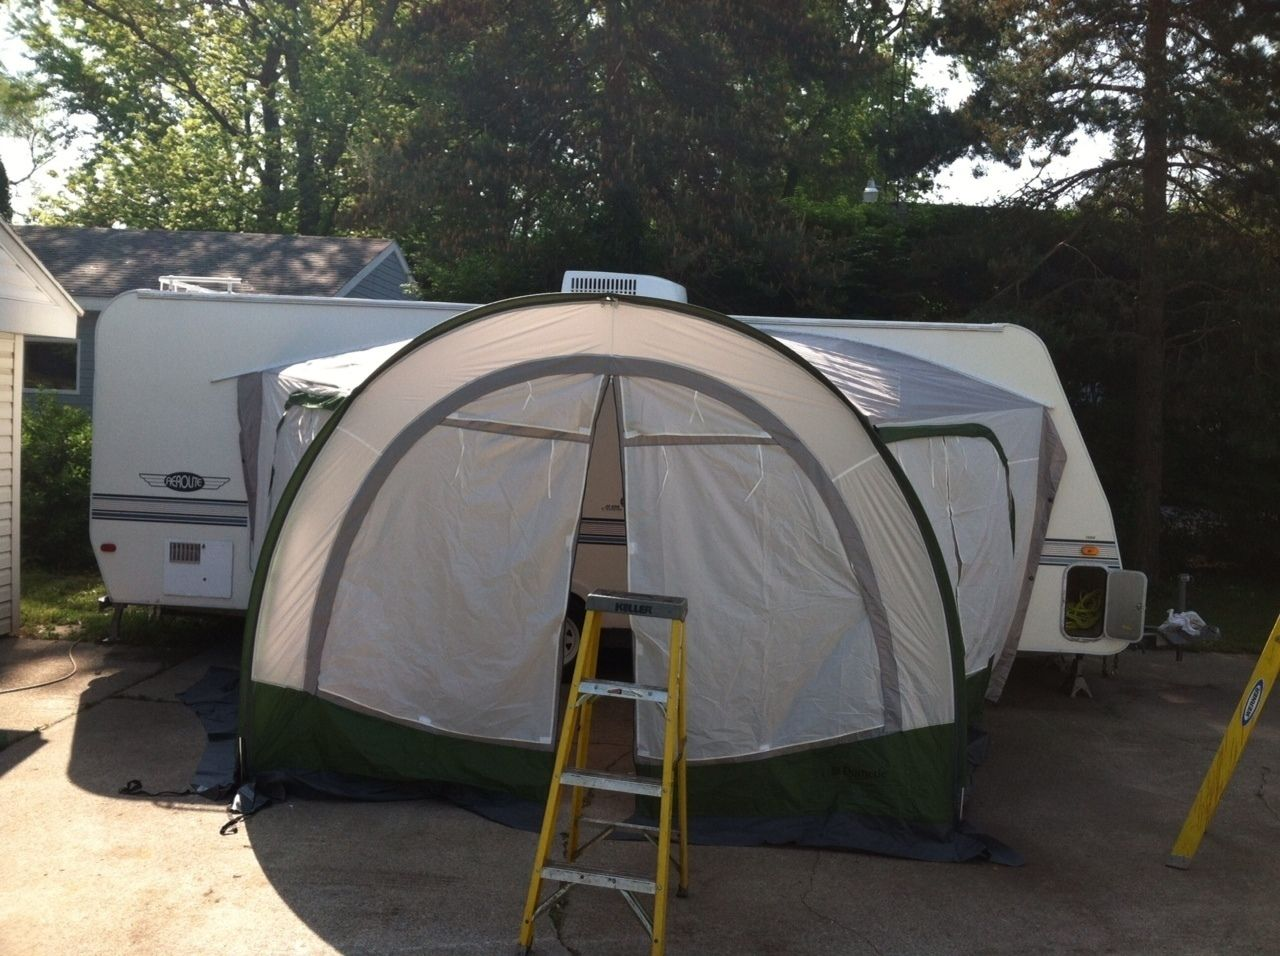 New Rv Camper Popup Ae Dometic 16 Cabana Screen Room Privacy Awning R Pod Picclick Com Rv Campers R Pod Rv